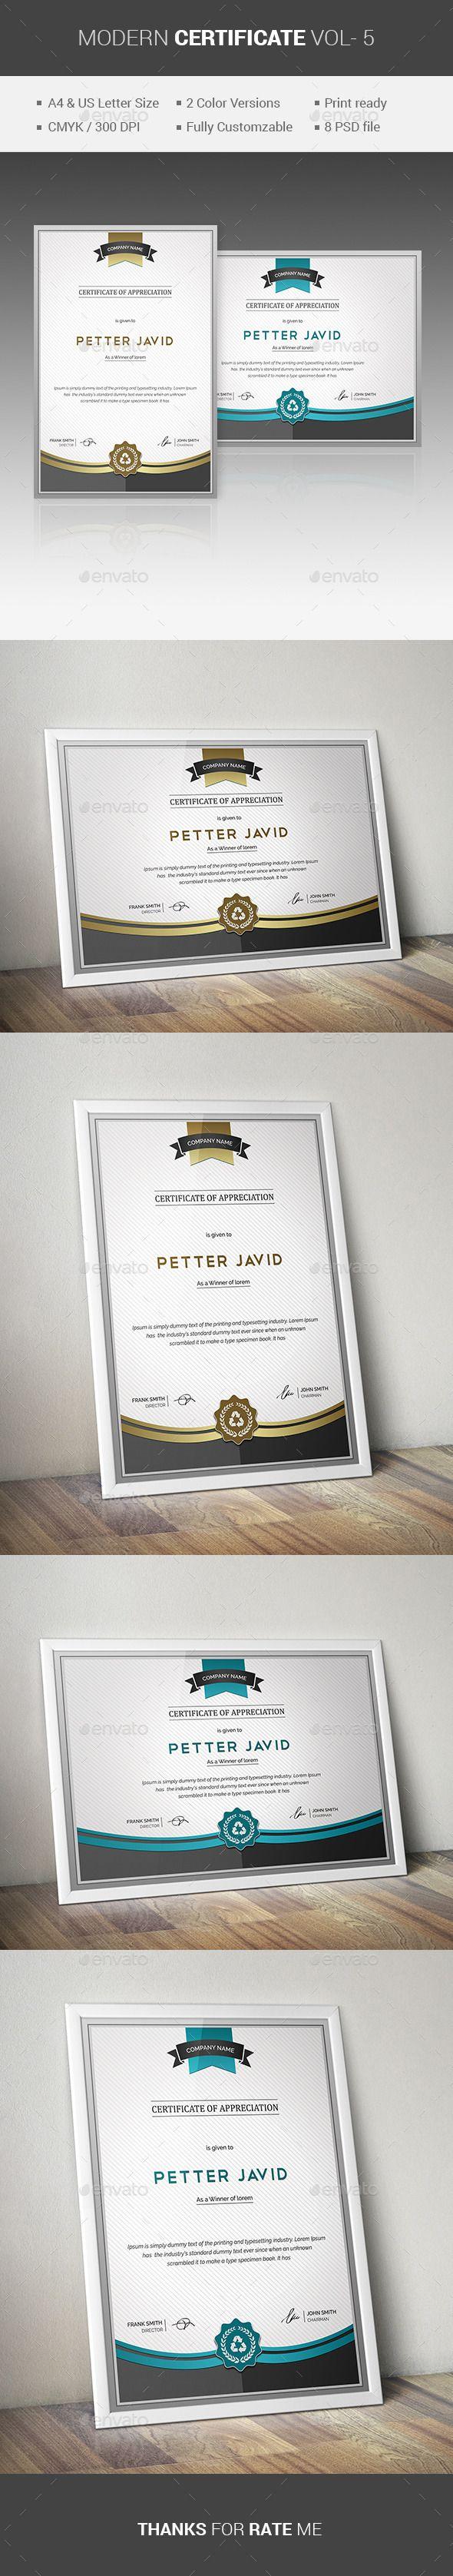 Certificate Template | Zertifikat, Zertifikat design und Designs